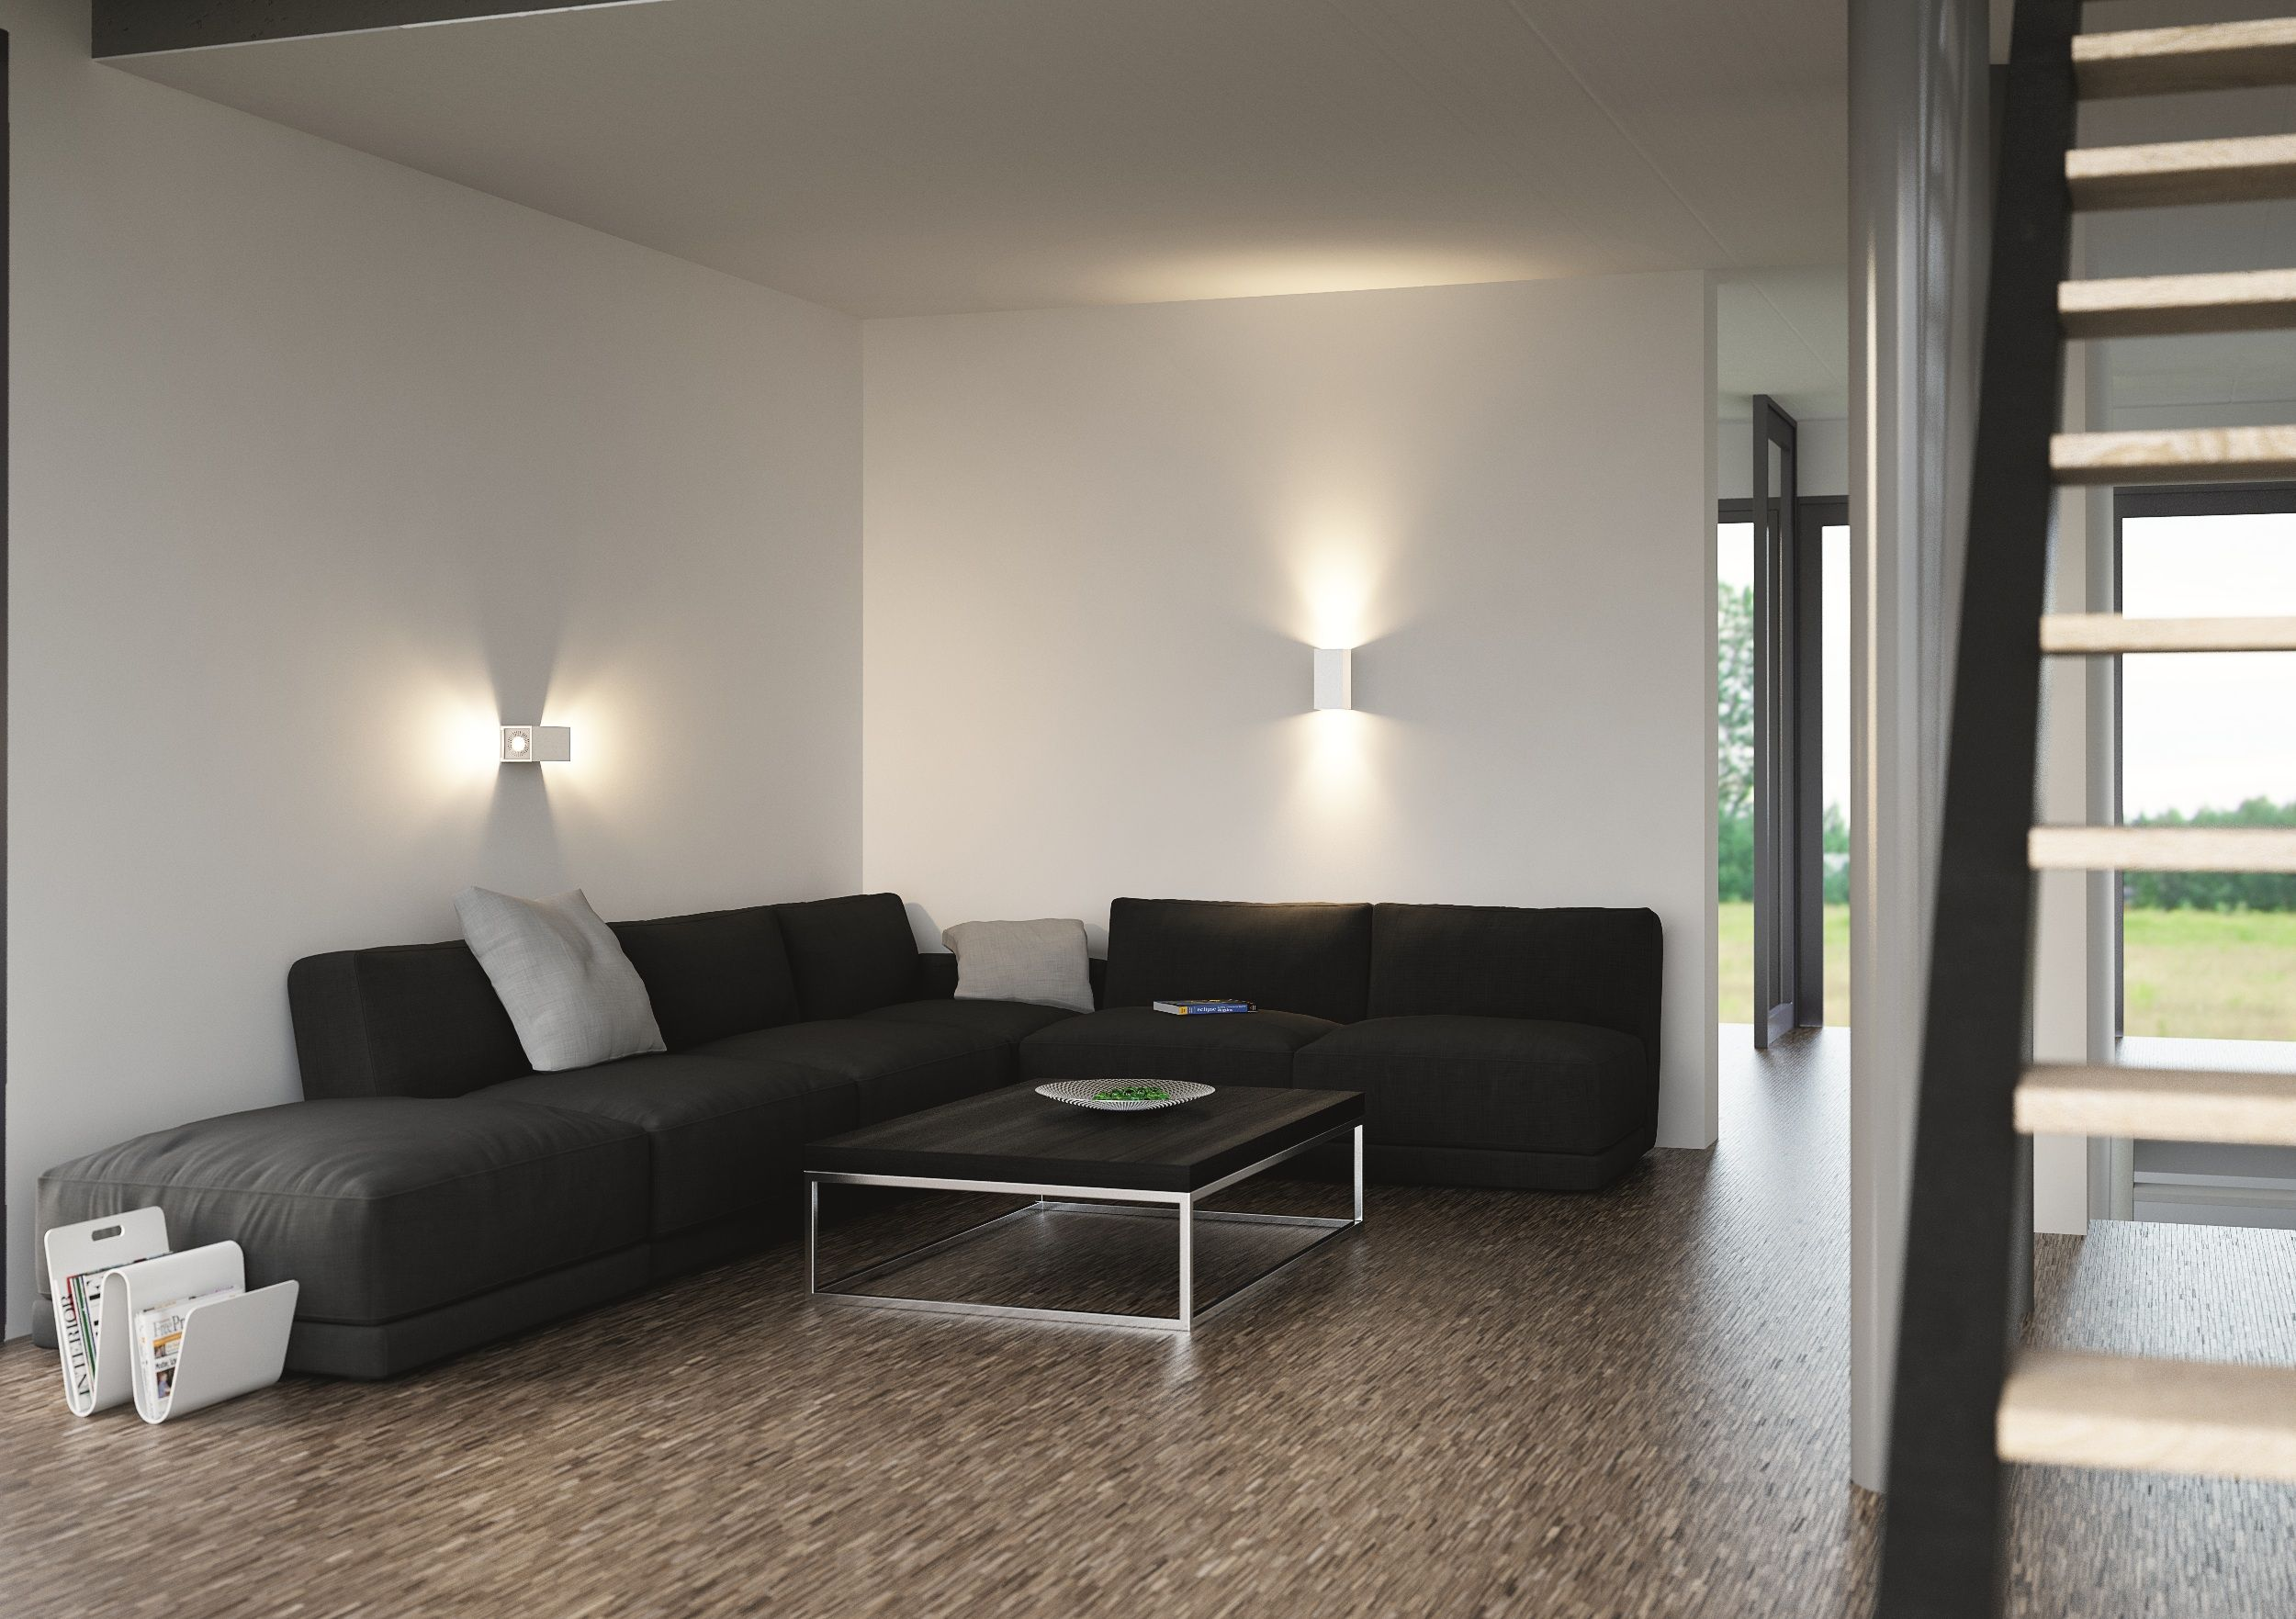 verlichting woonkamer - Google zoeken | Verlichting | Pinterest ...